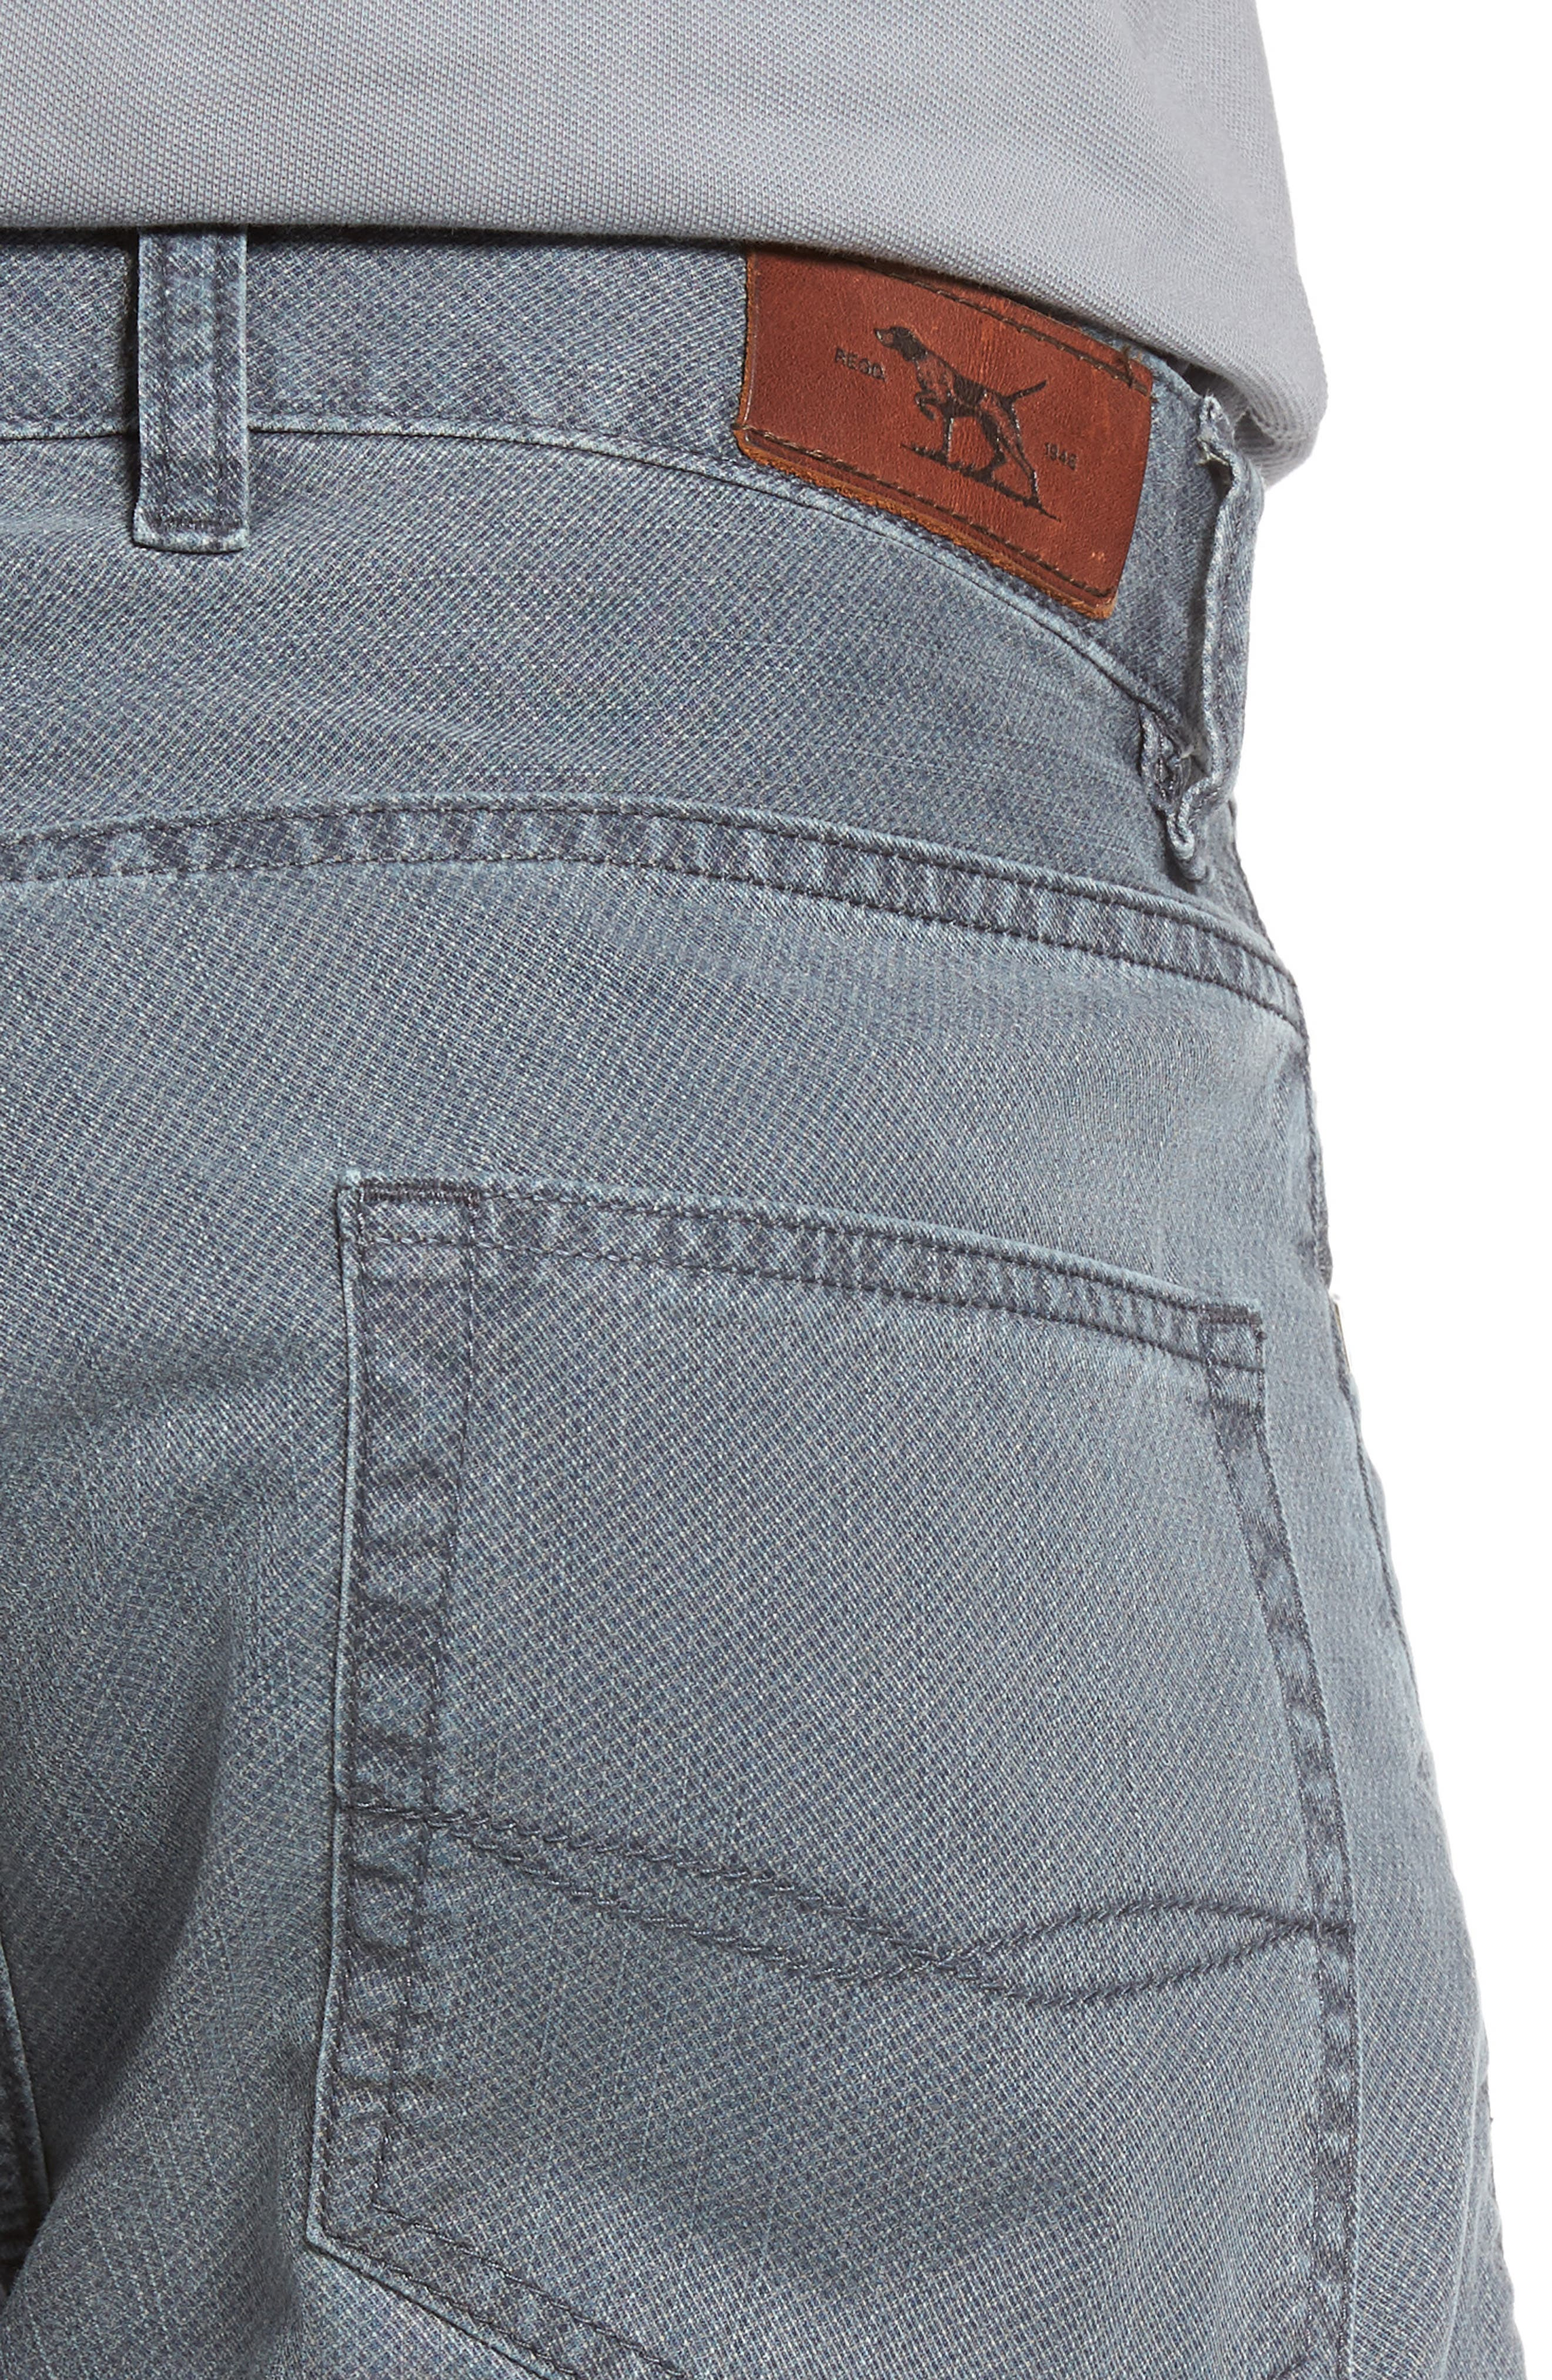 Landsborough Straight Leg Jeans,                             Alternate thumbnail 4, color,                             069